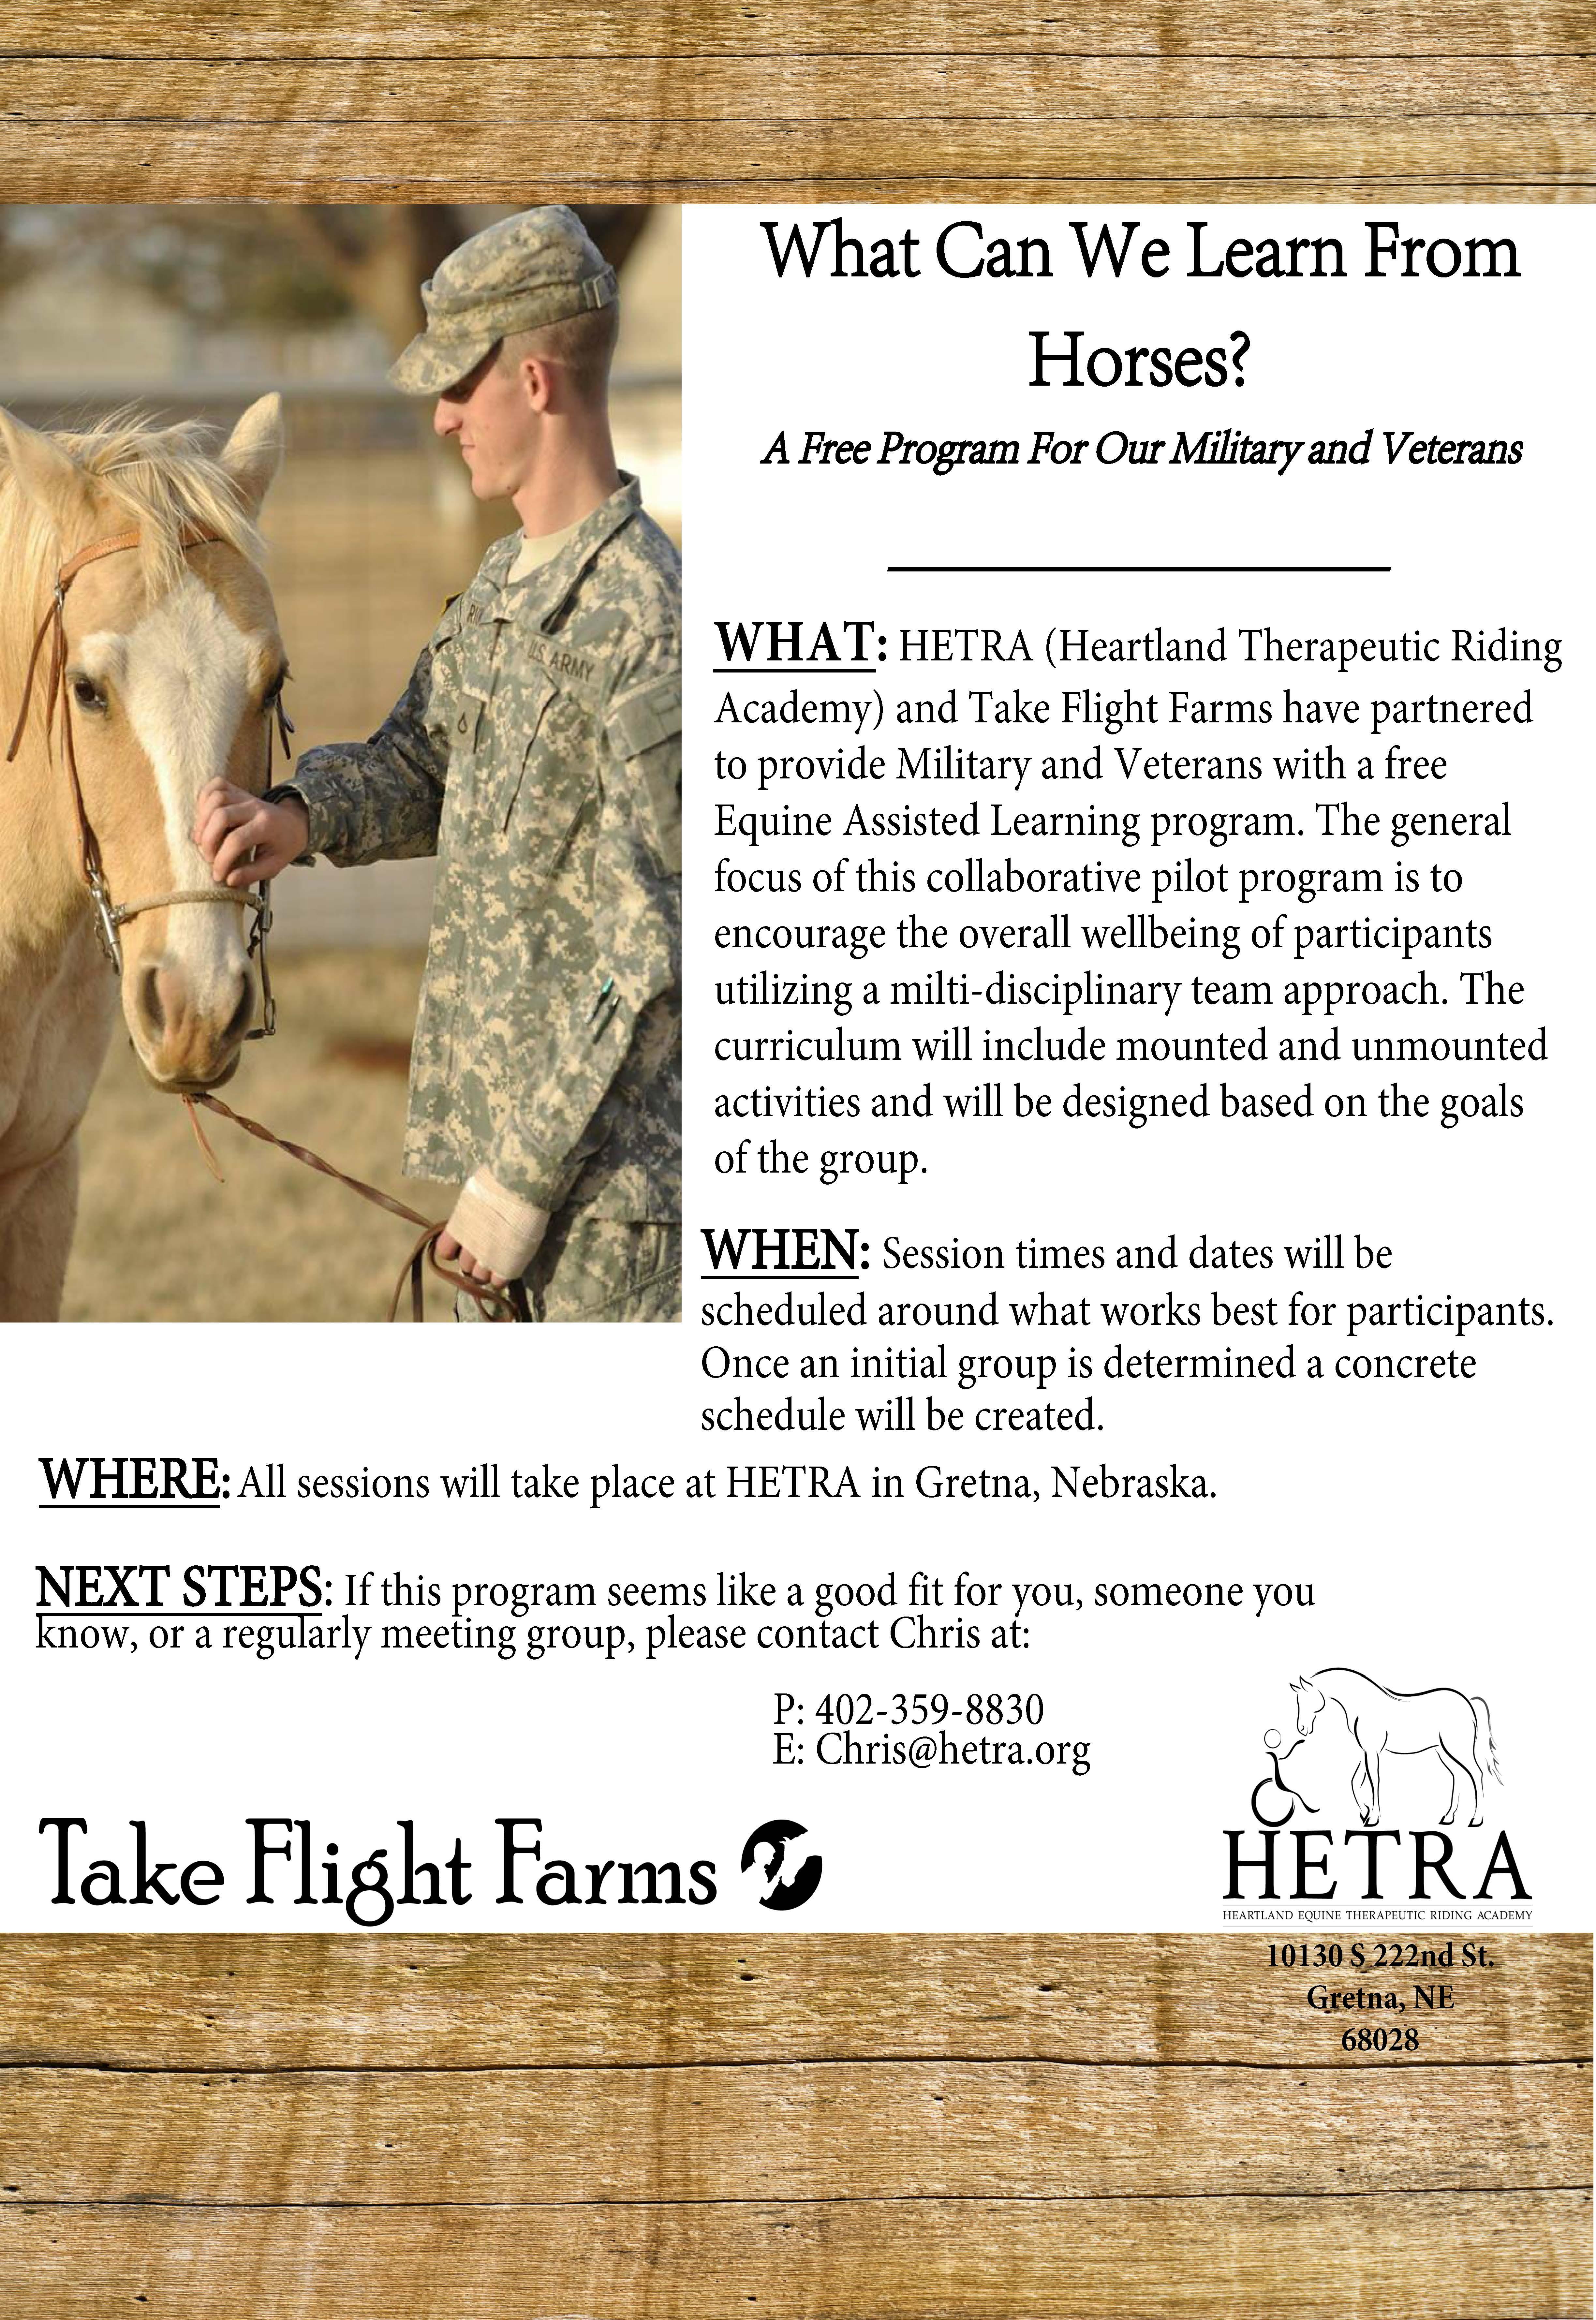 Military Program in Partnership with HETRA | Take Flight Farms